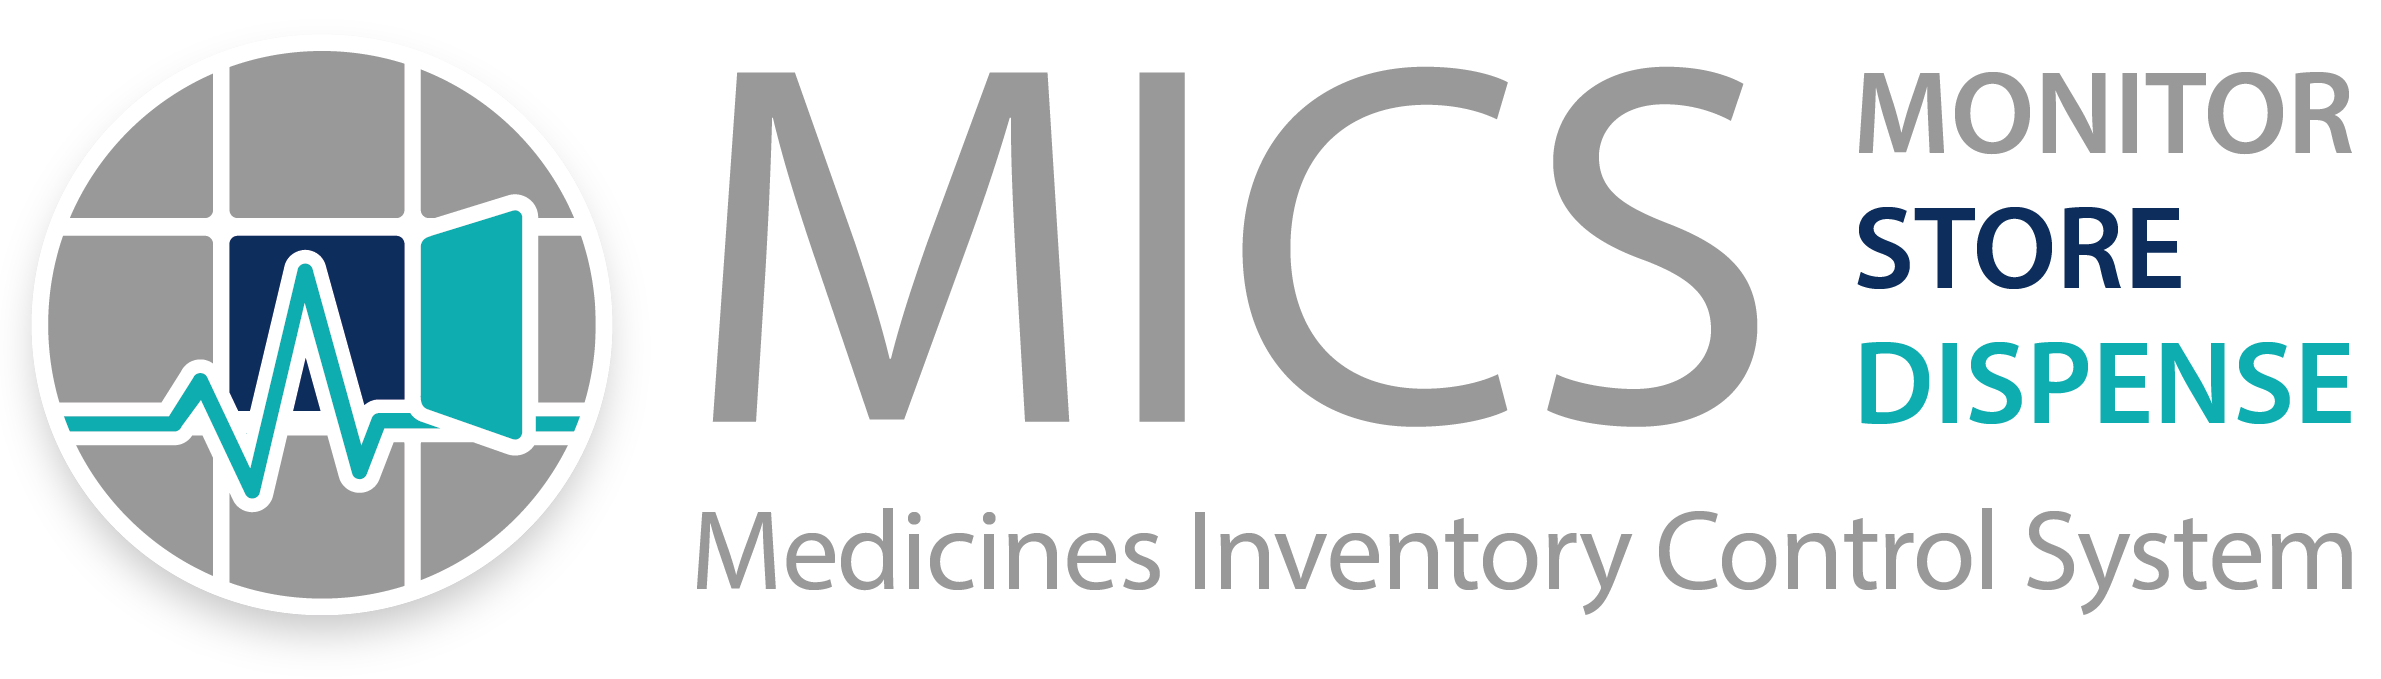 medicine inventory control system